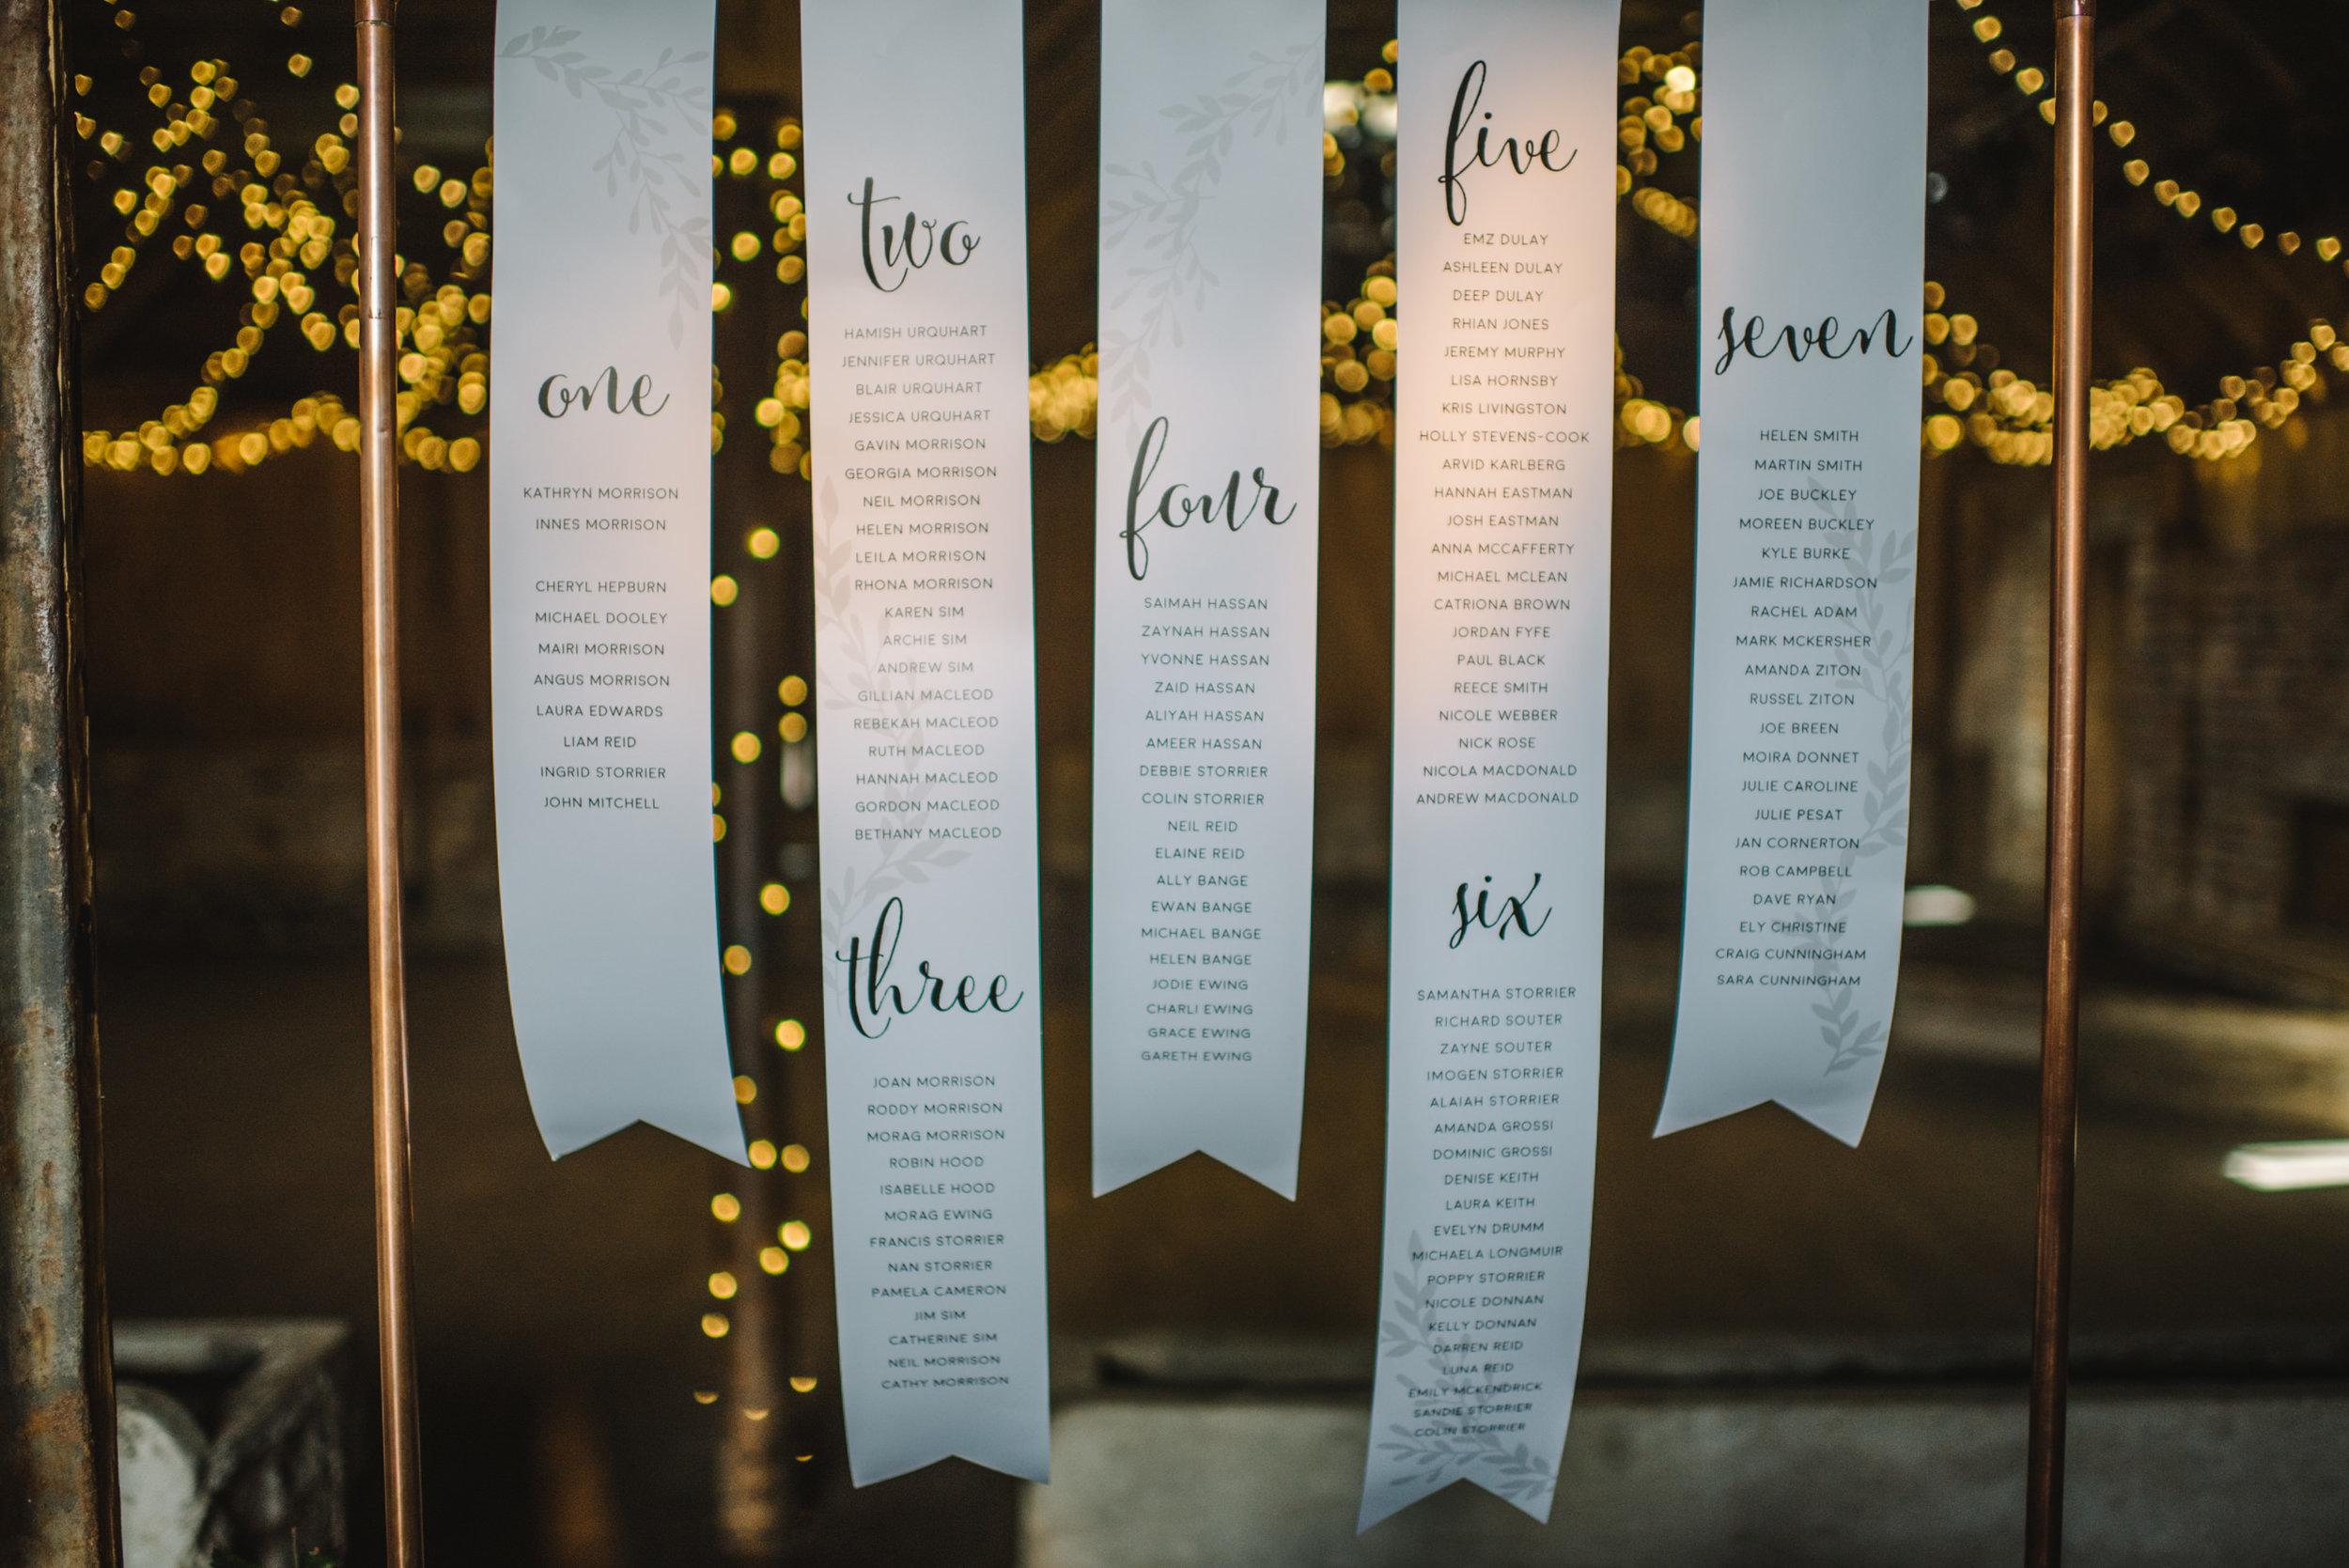 0159-LISA-DEVINE-PHOTOGRAPHY-ALTERNATIVE-WEDDING-PHOTOGRAPHY-SCOTLAND-DESTINATION-WEDDINGS-GLASGOW-WEDDINGS-COOL-WEDDINGS-STYLISH-WEDDINGS.JPG